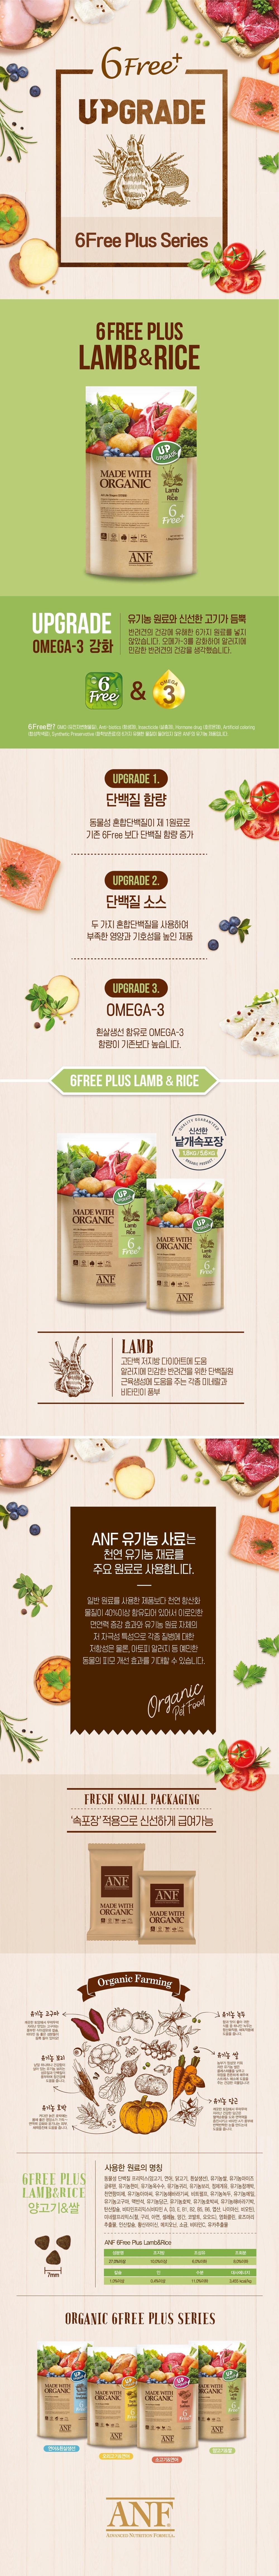 ANF 유기농 6FreePlus 양고기&쌀 (1.8kg/5.6kg)-상품이미지-0